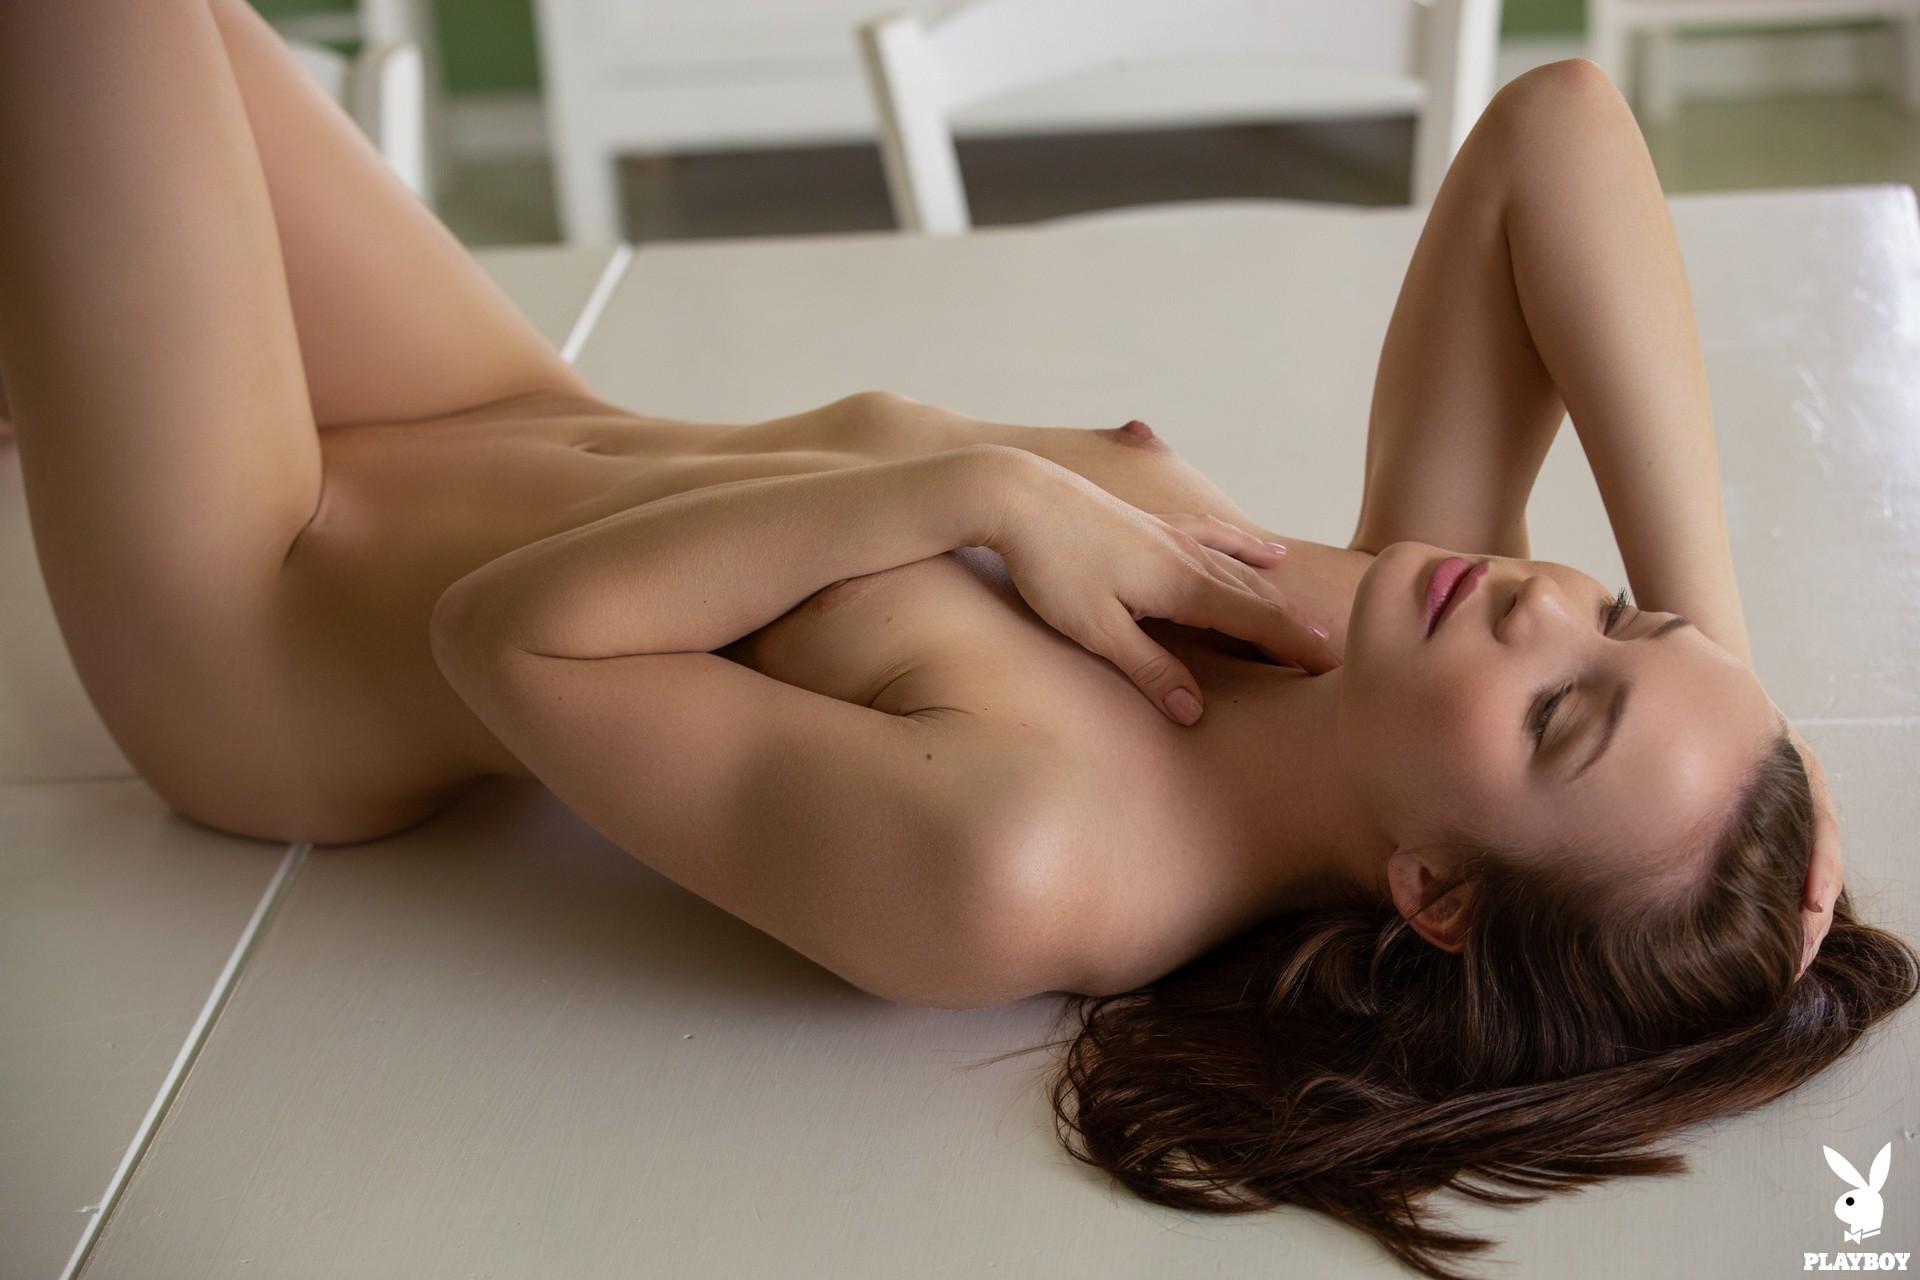 Janeth Tense in Delightful Daybreak - Playboy Plus 2